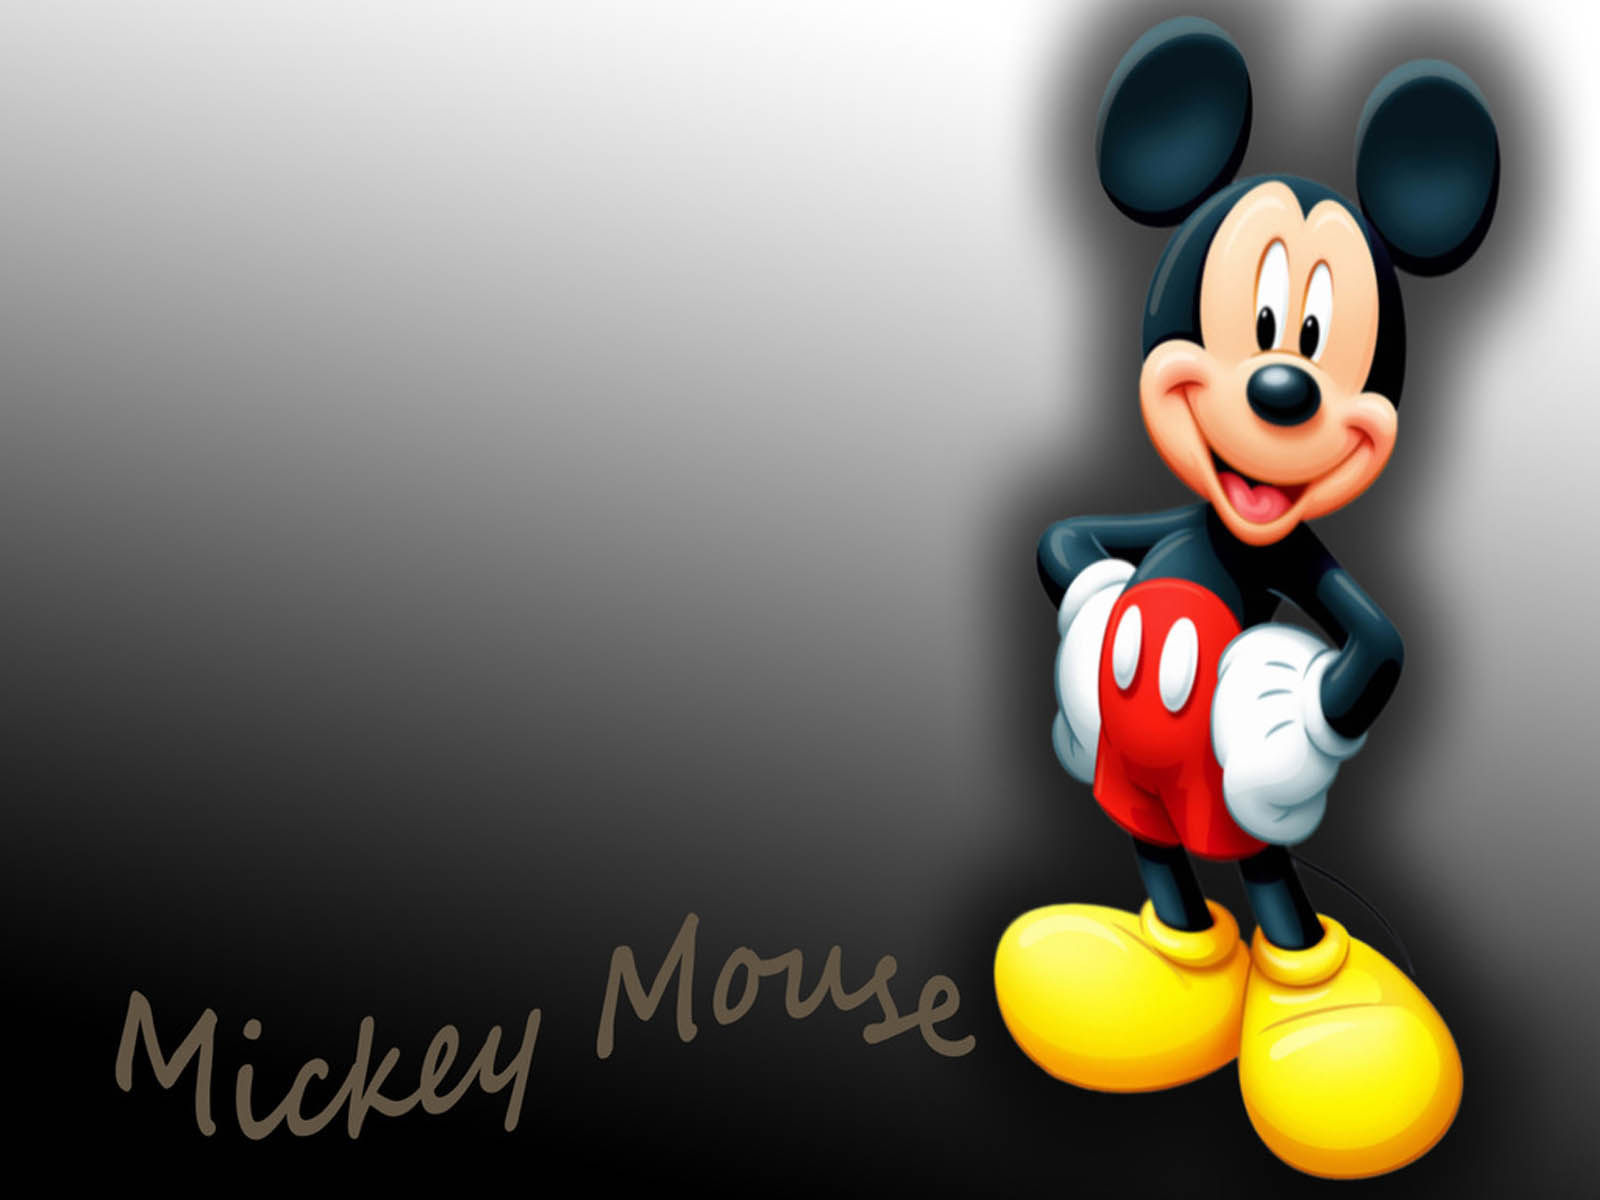 49 Mickey Mouse Wallpaper Desktop On Wallpapersafari